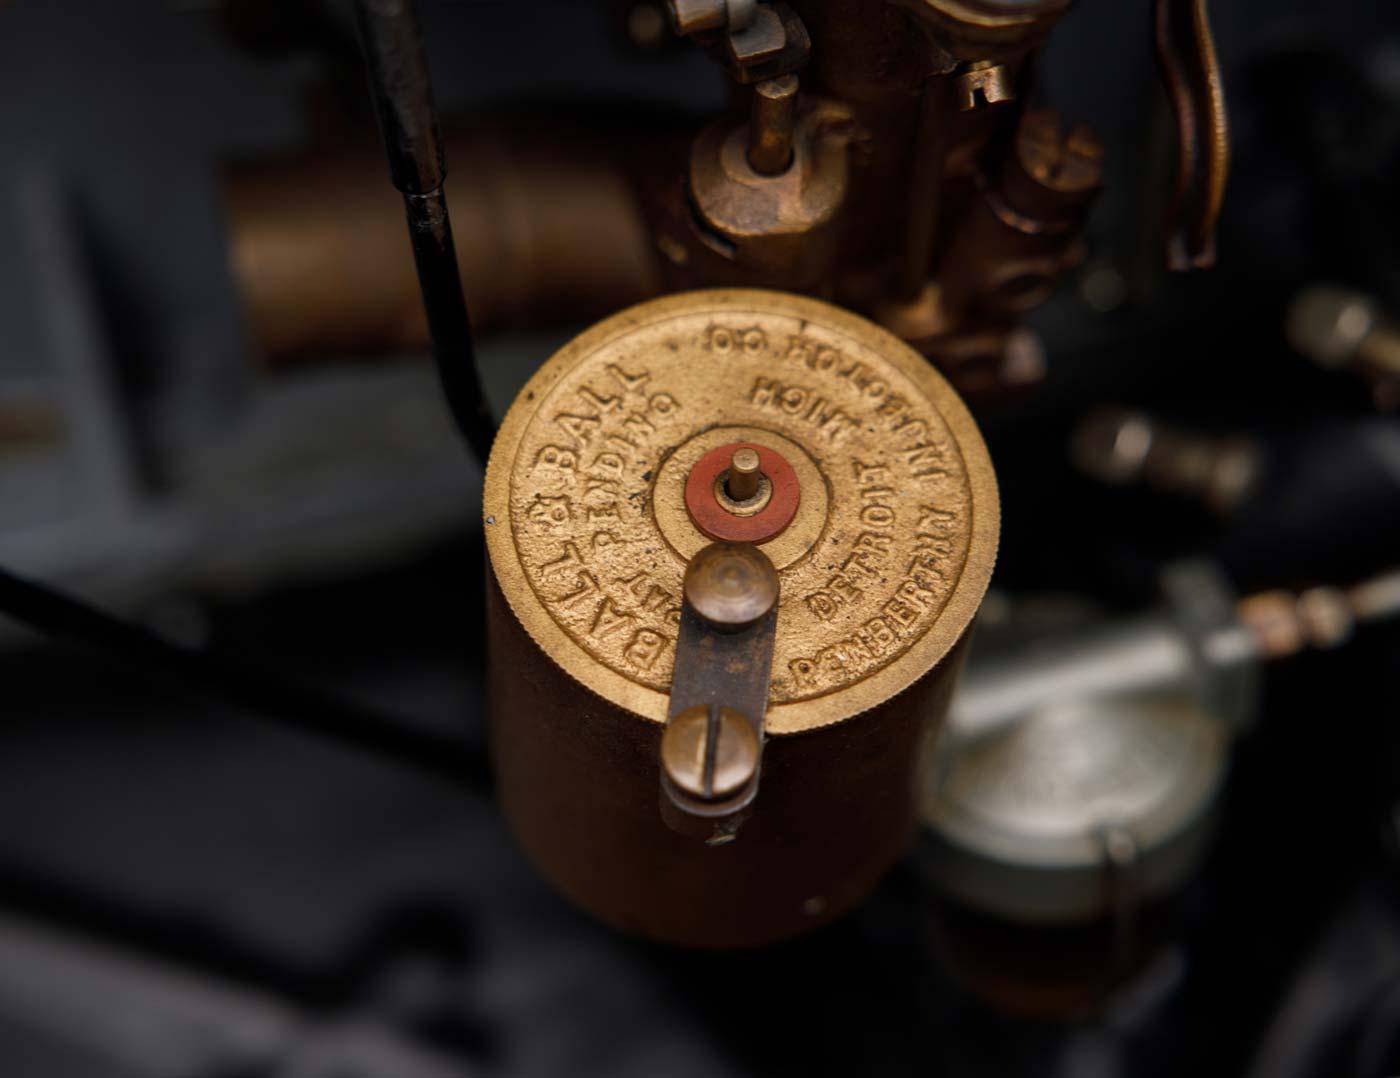 1923 Studebaker Big Six Speedster - The JBS Collection